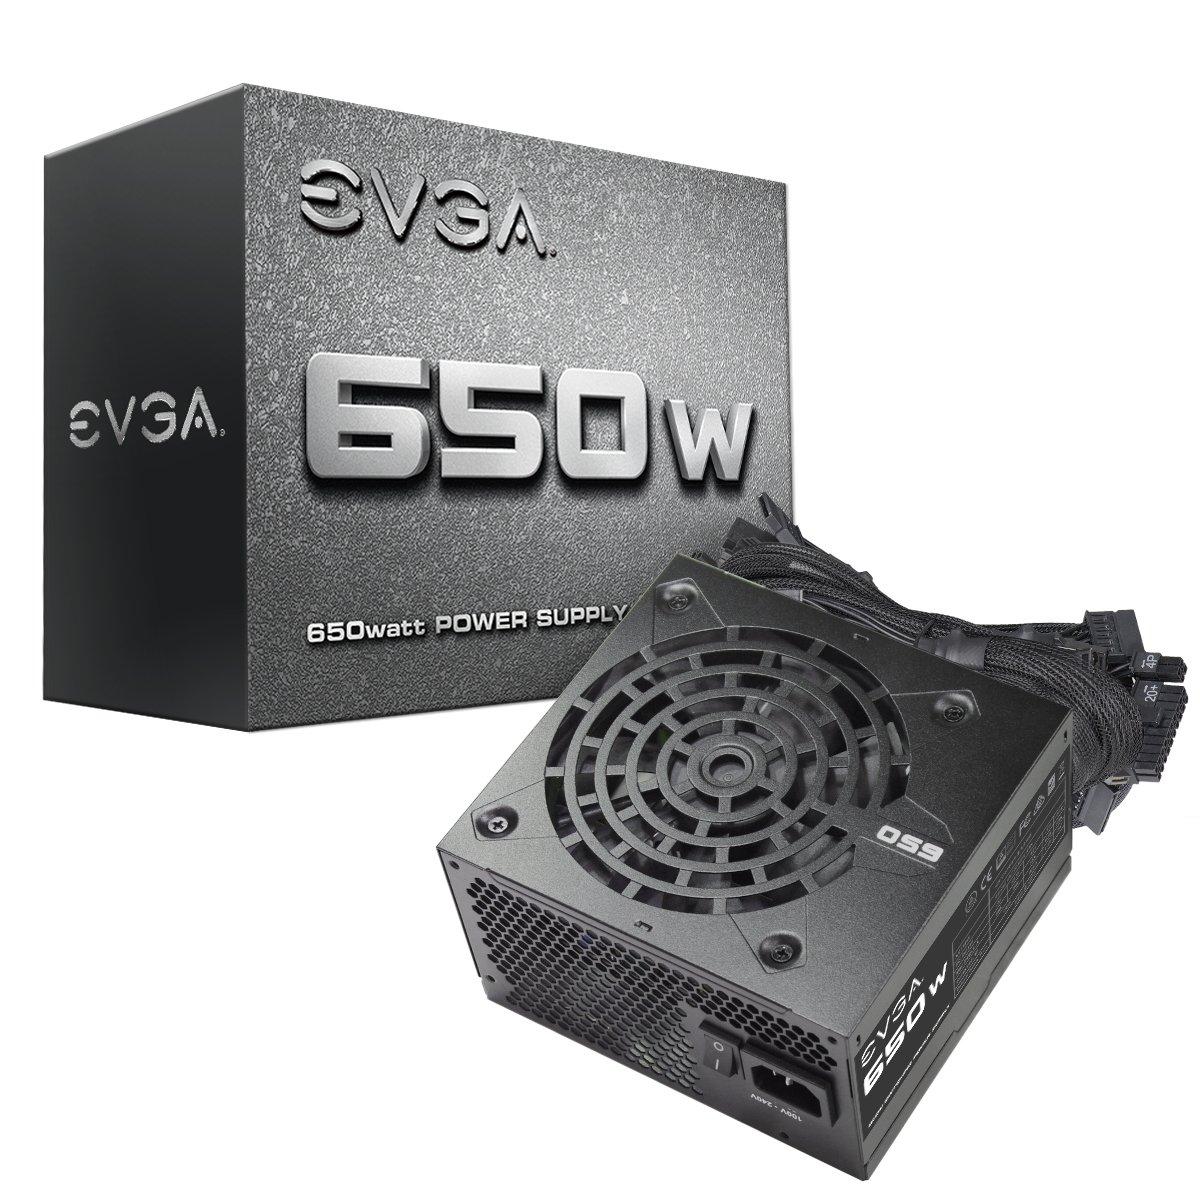 EVGA 650W PSU